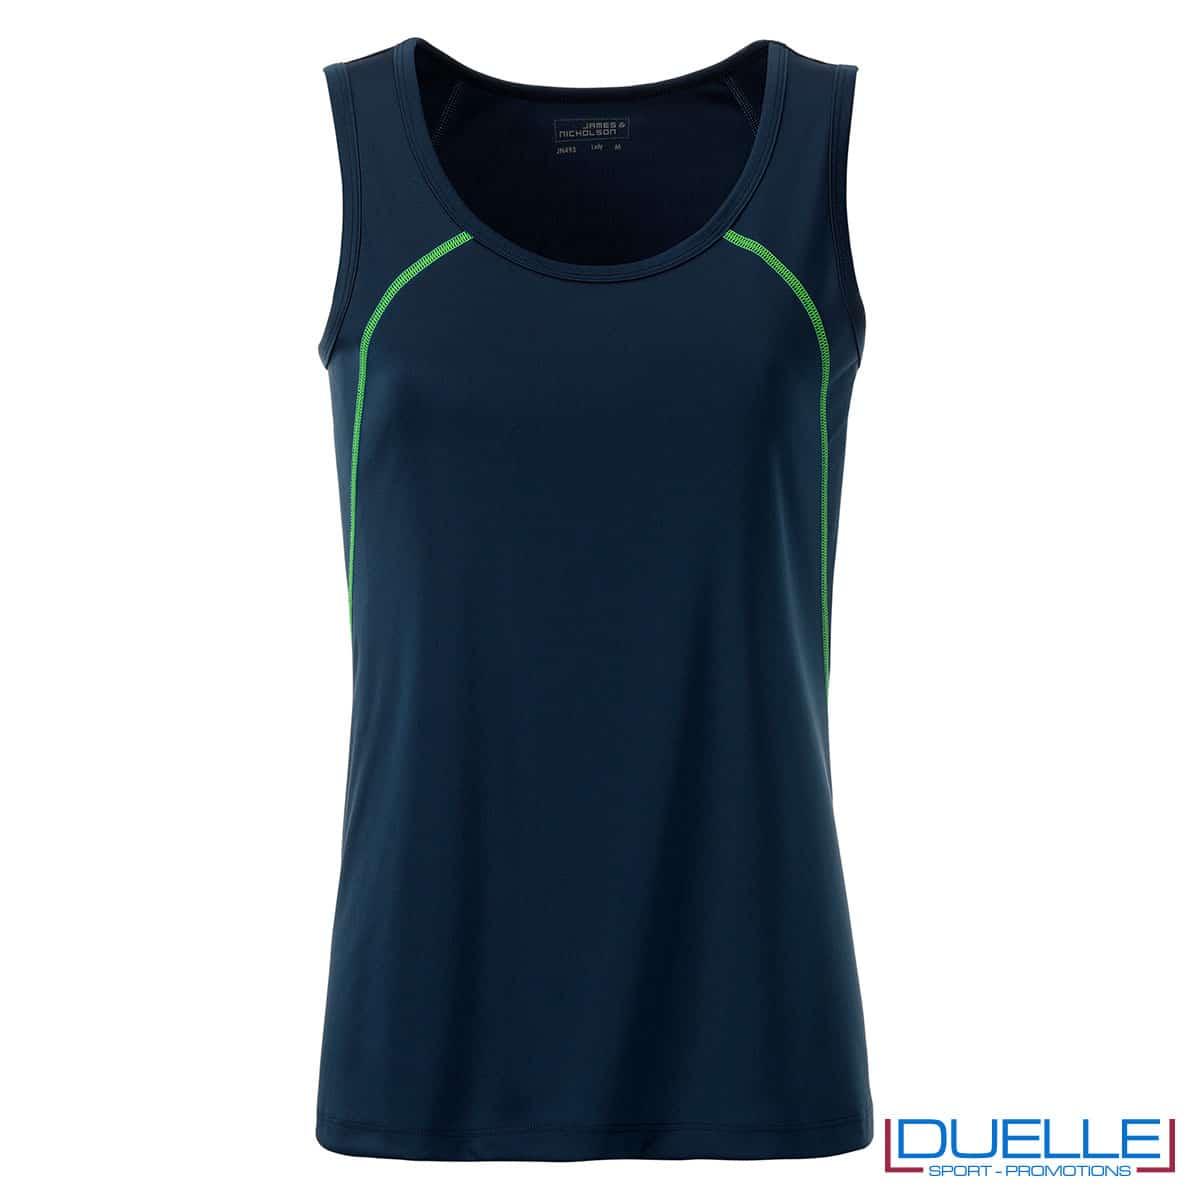 Canottiera blu navy sportiva per donna